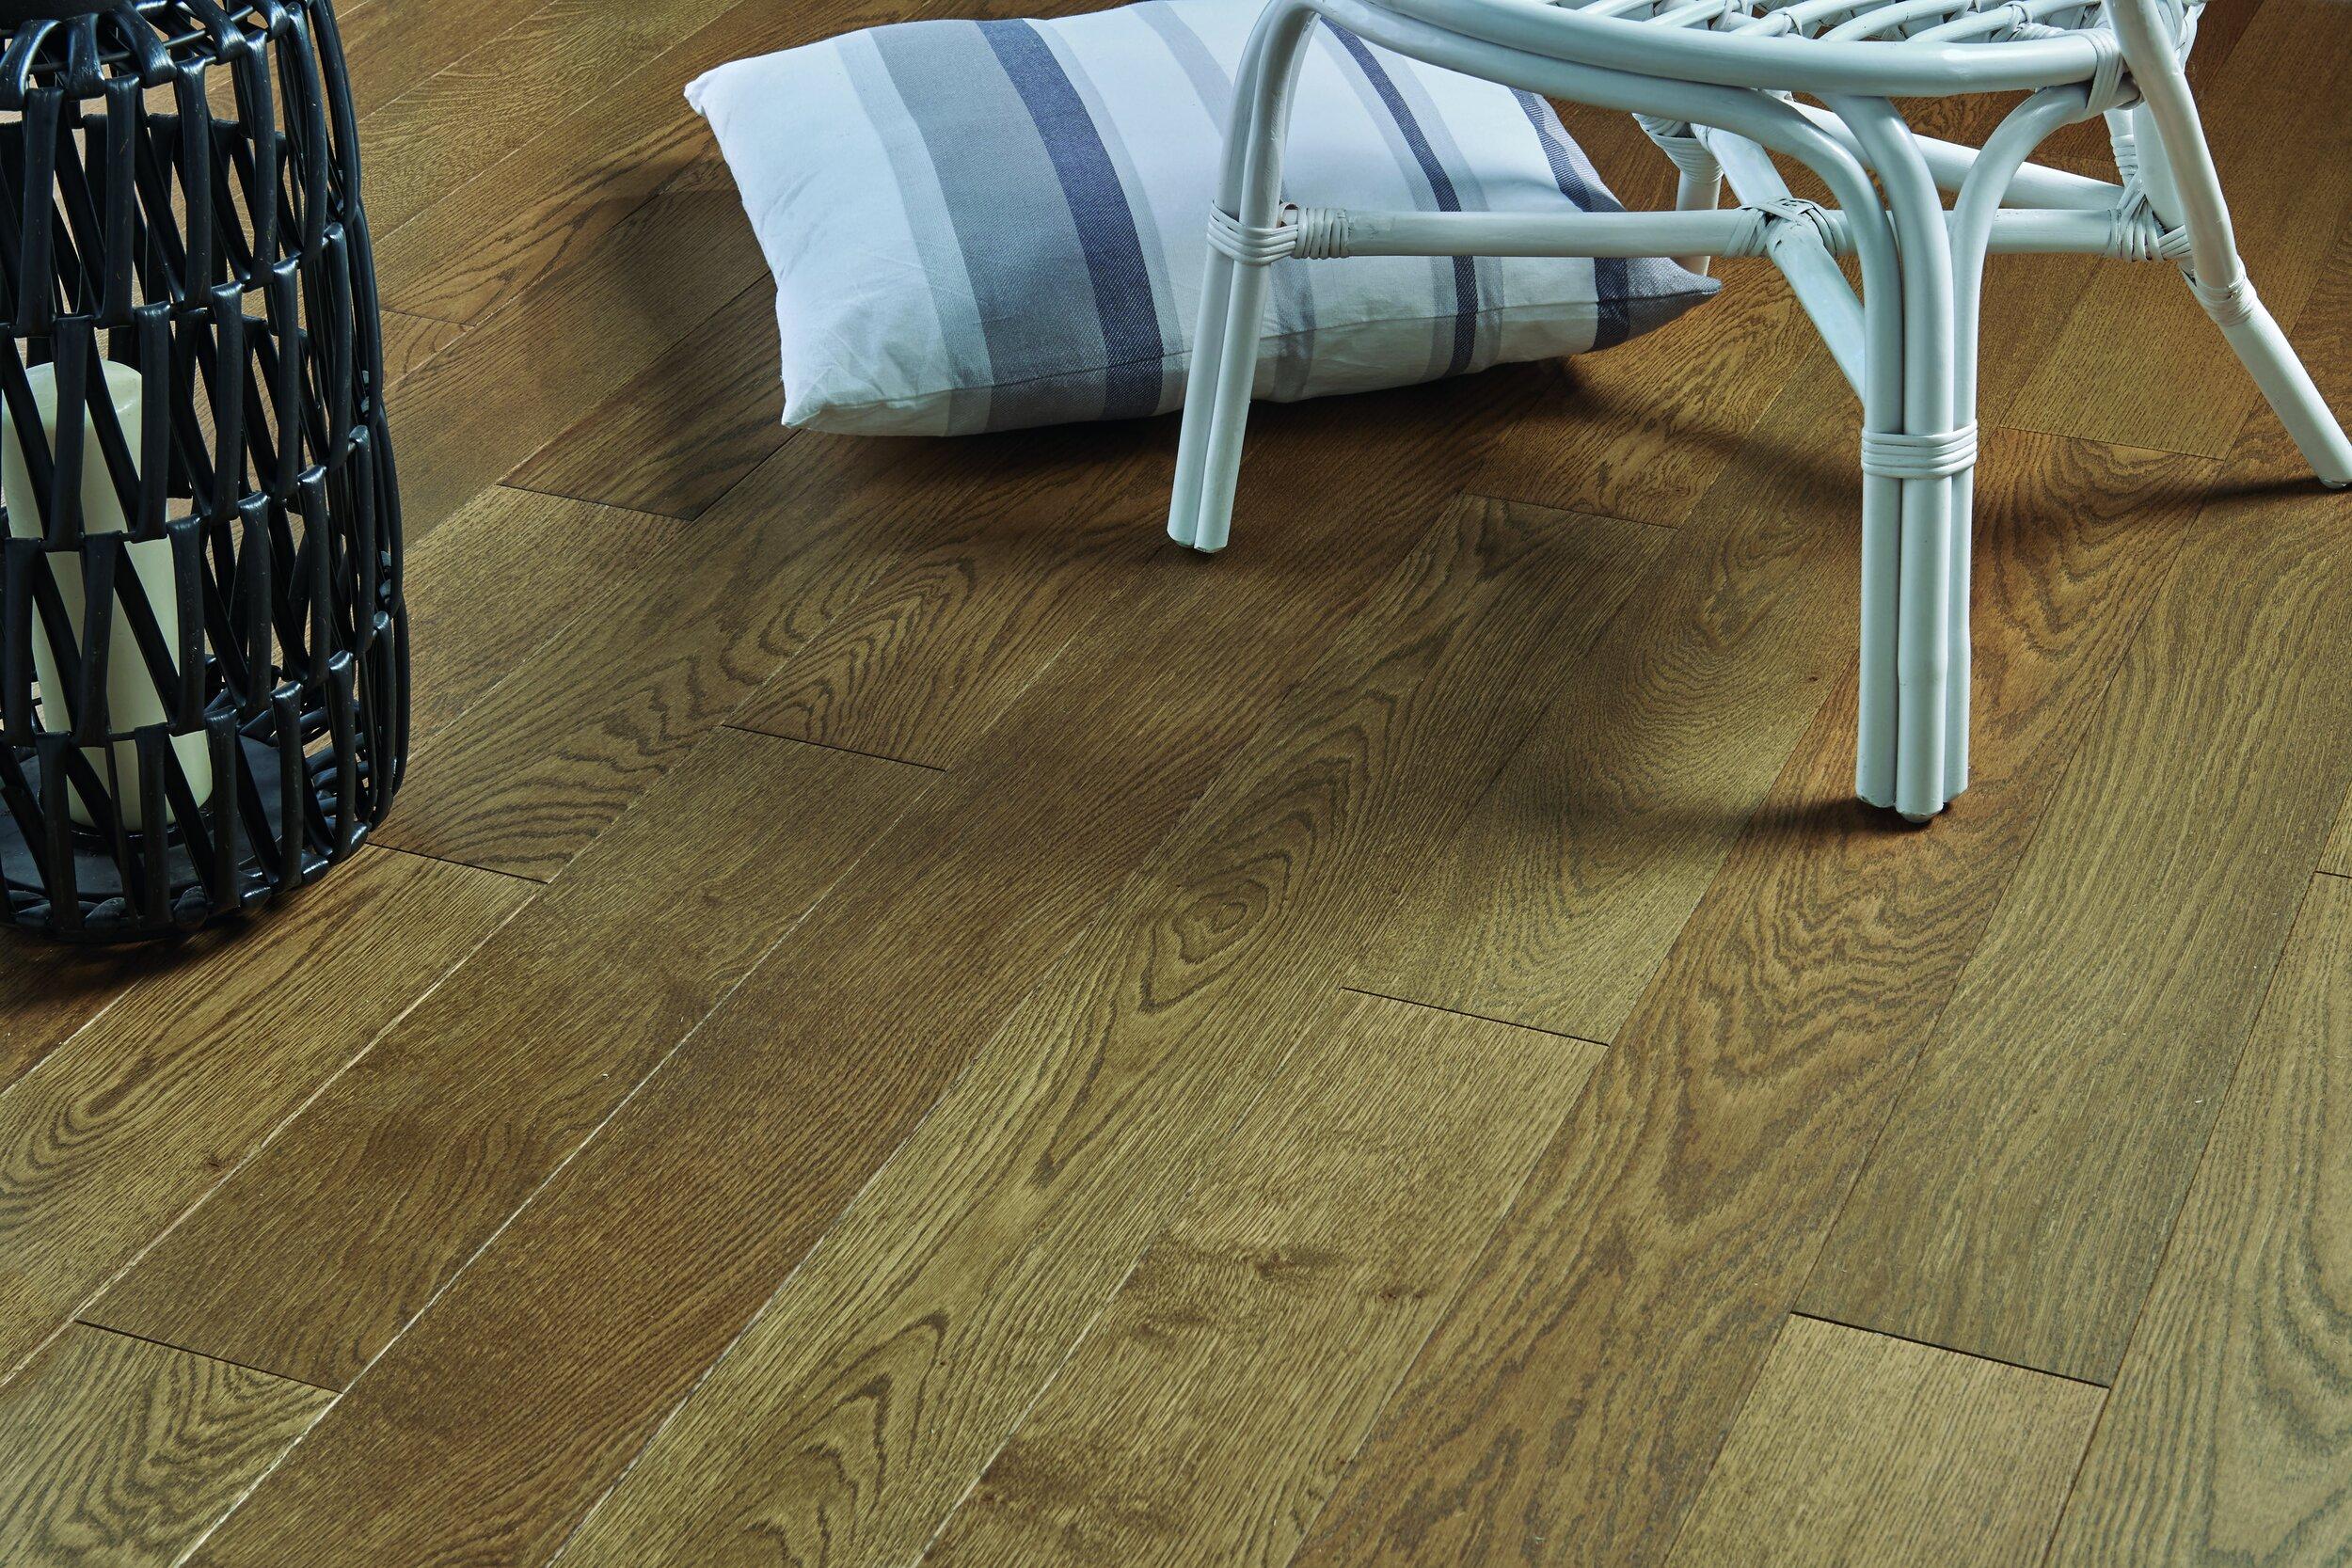 Textured Finish To Wood Flooring